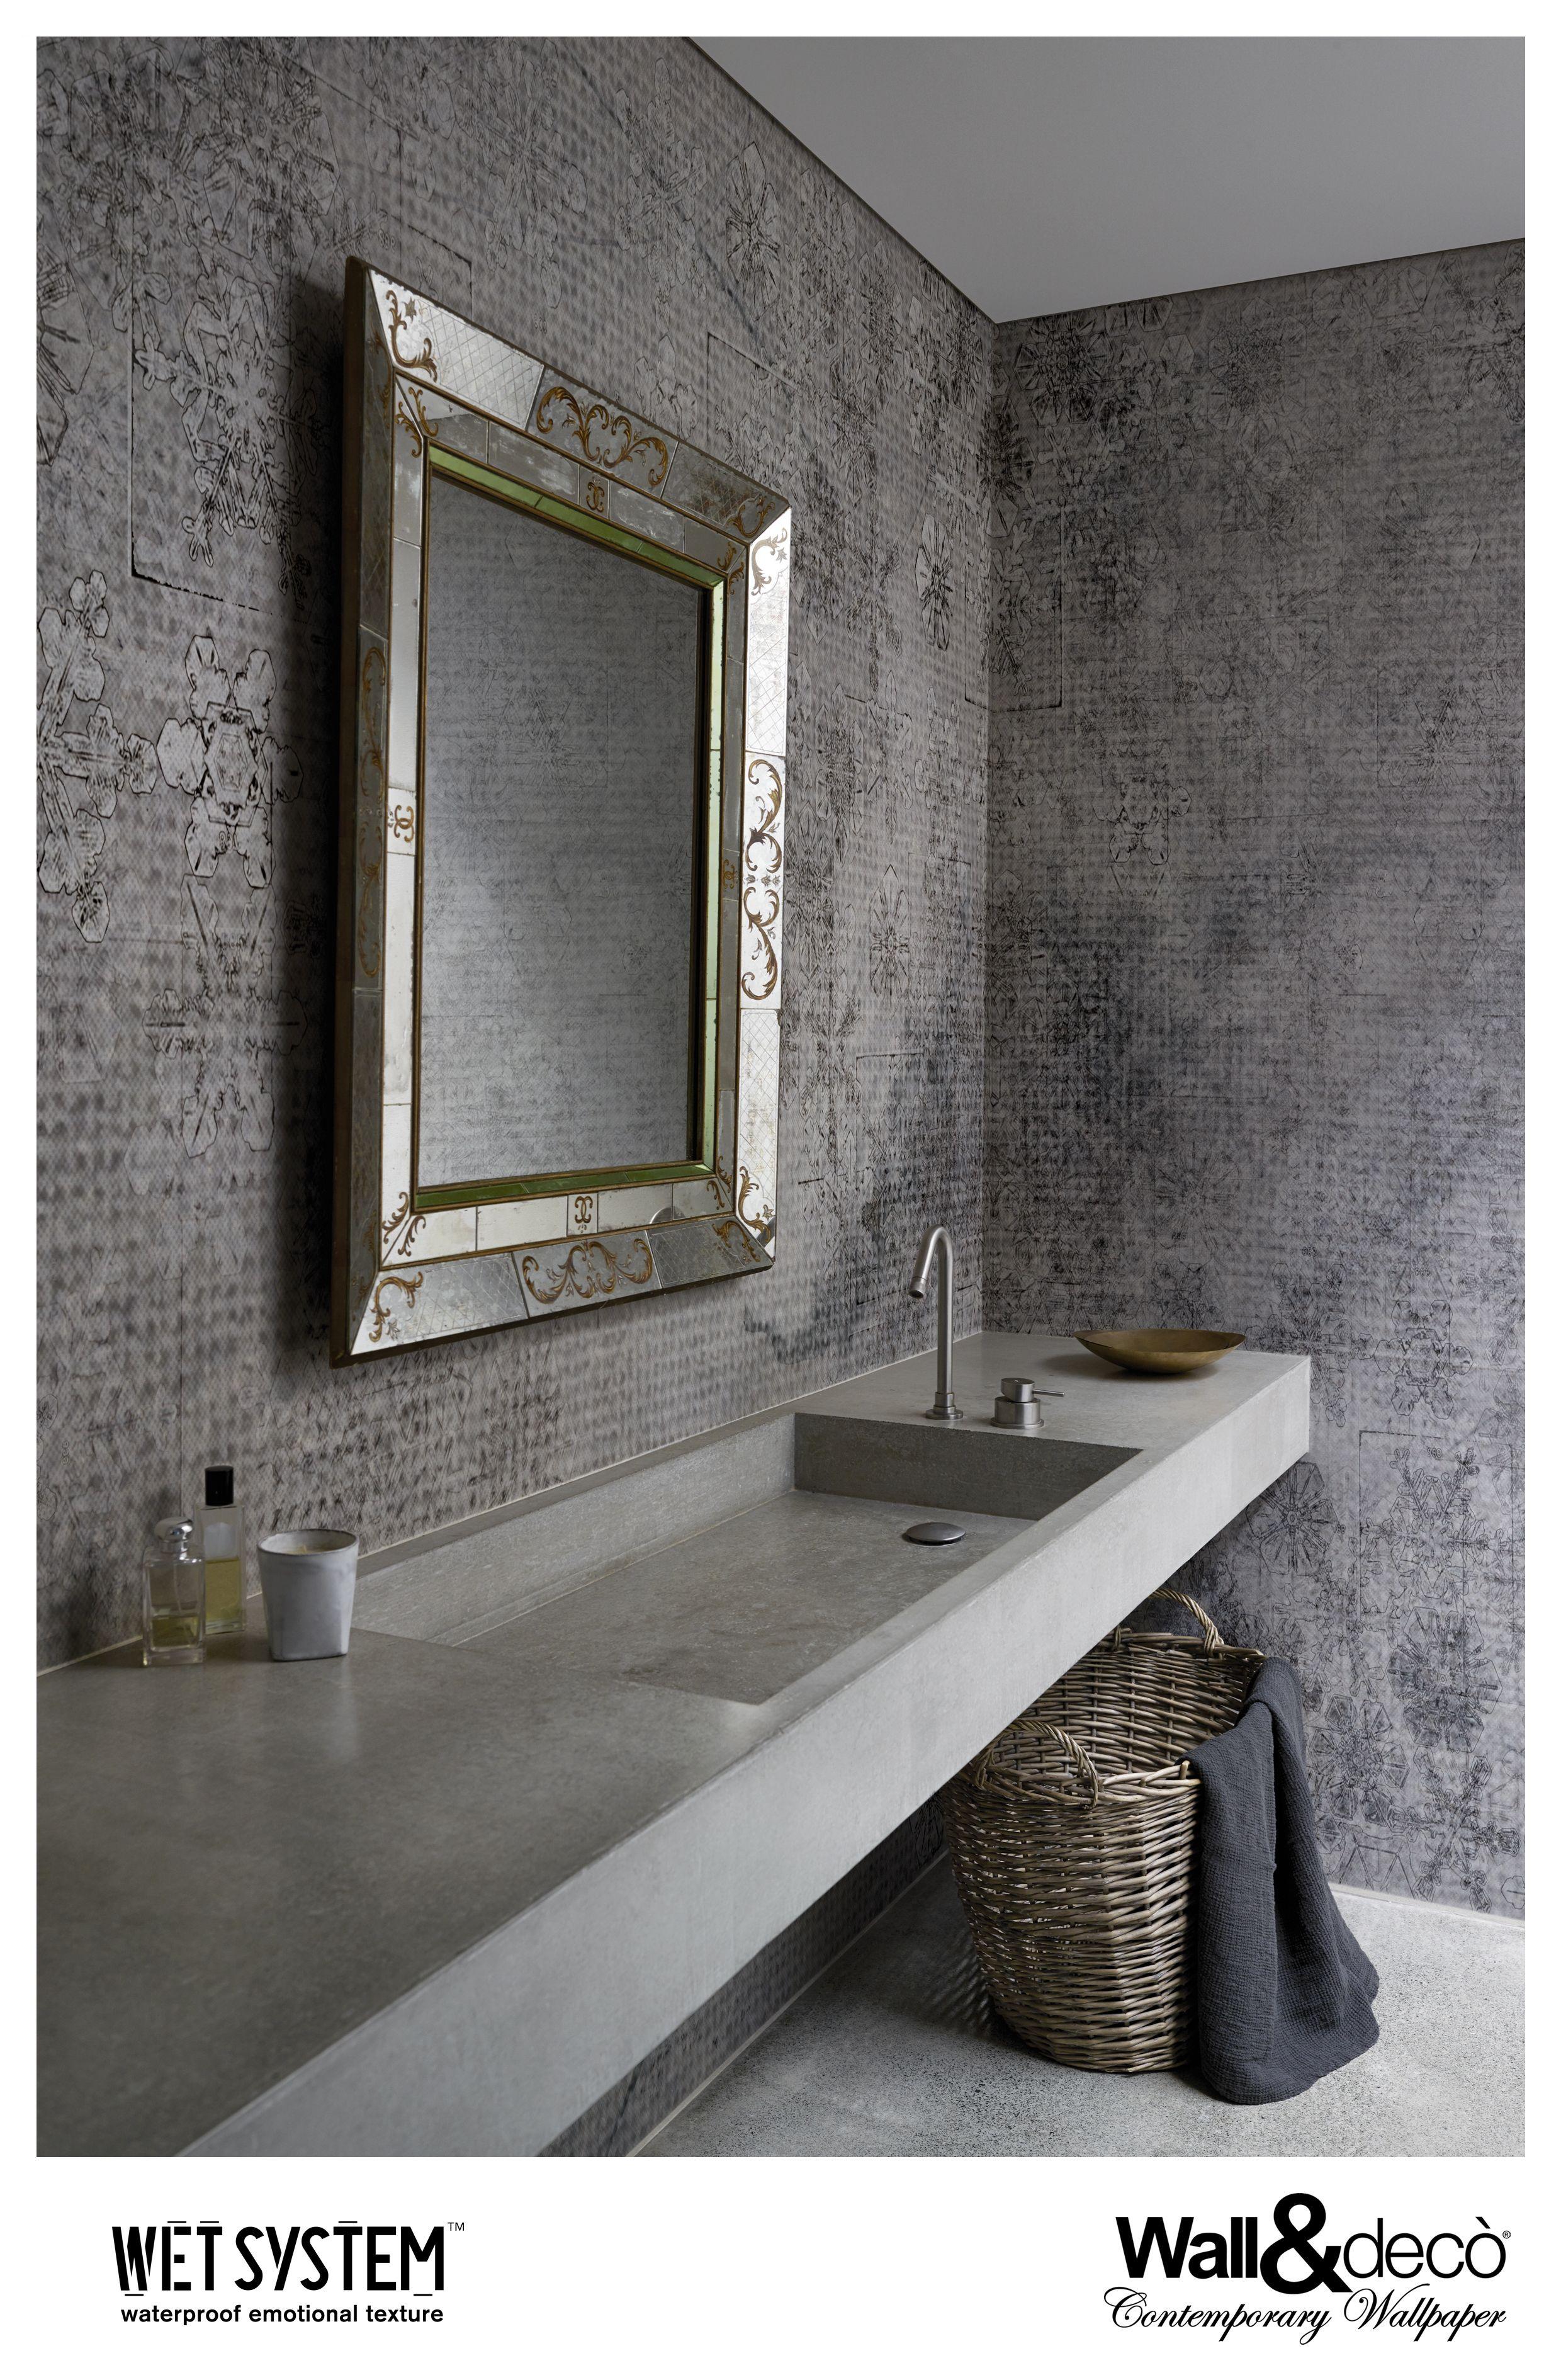 Crystal Water Www Wallanddeco Com Wallpaper Wallcovering Wetsystem Badezimmer Tapete Deko Wand Glas Badezimmer